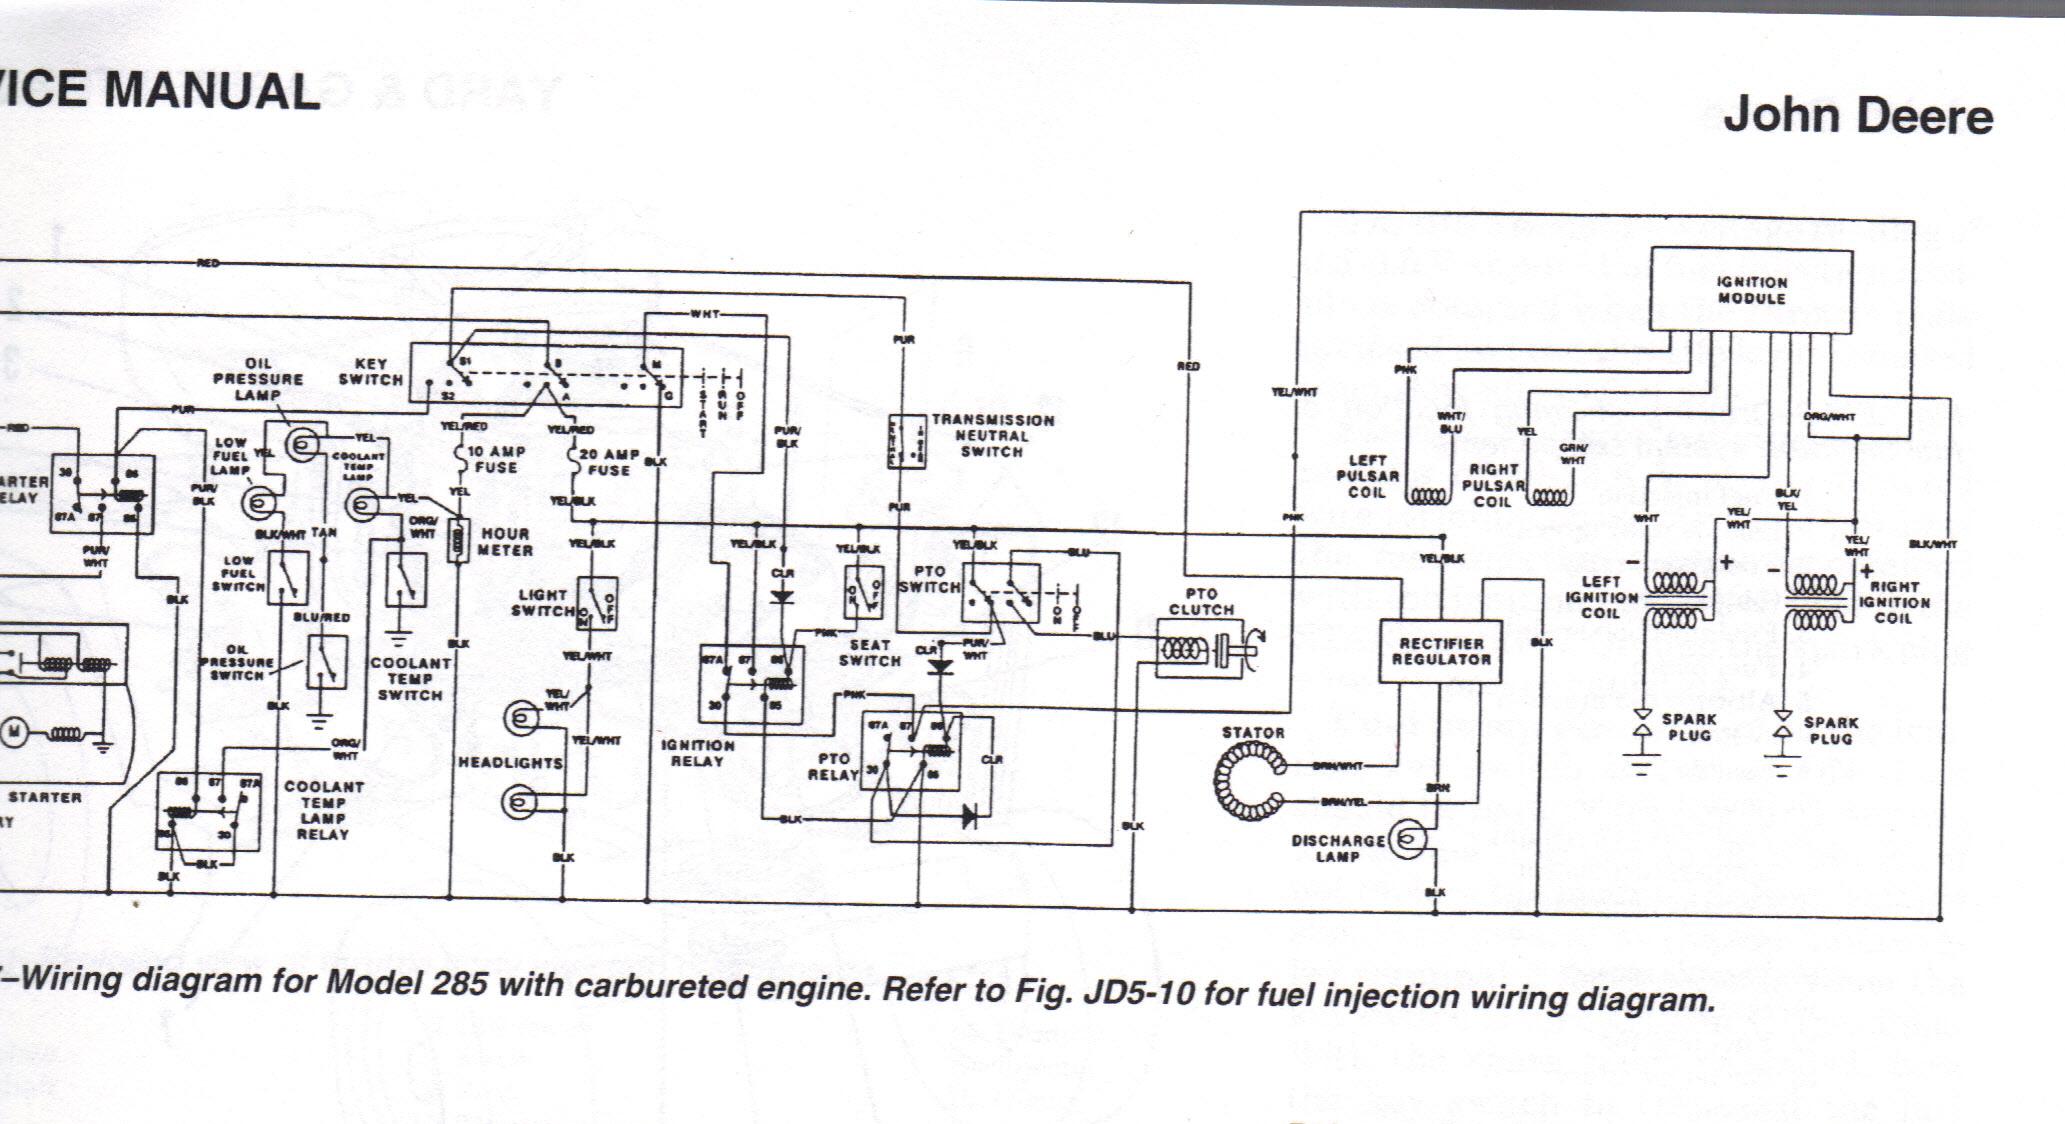 john deere la105 wiring diagram solidfonts john deere 4430 wiring diagram nilza net